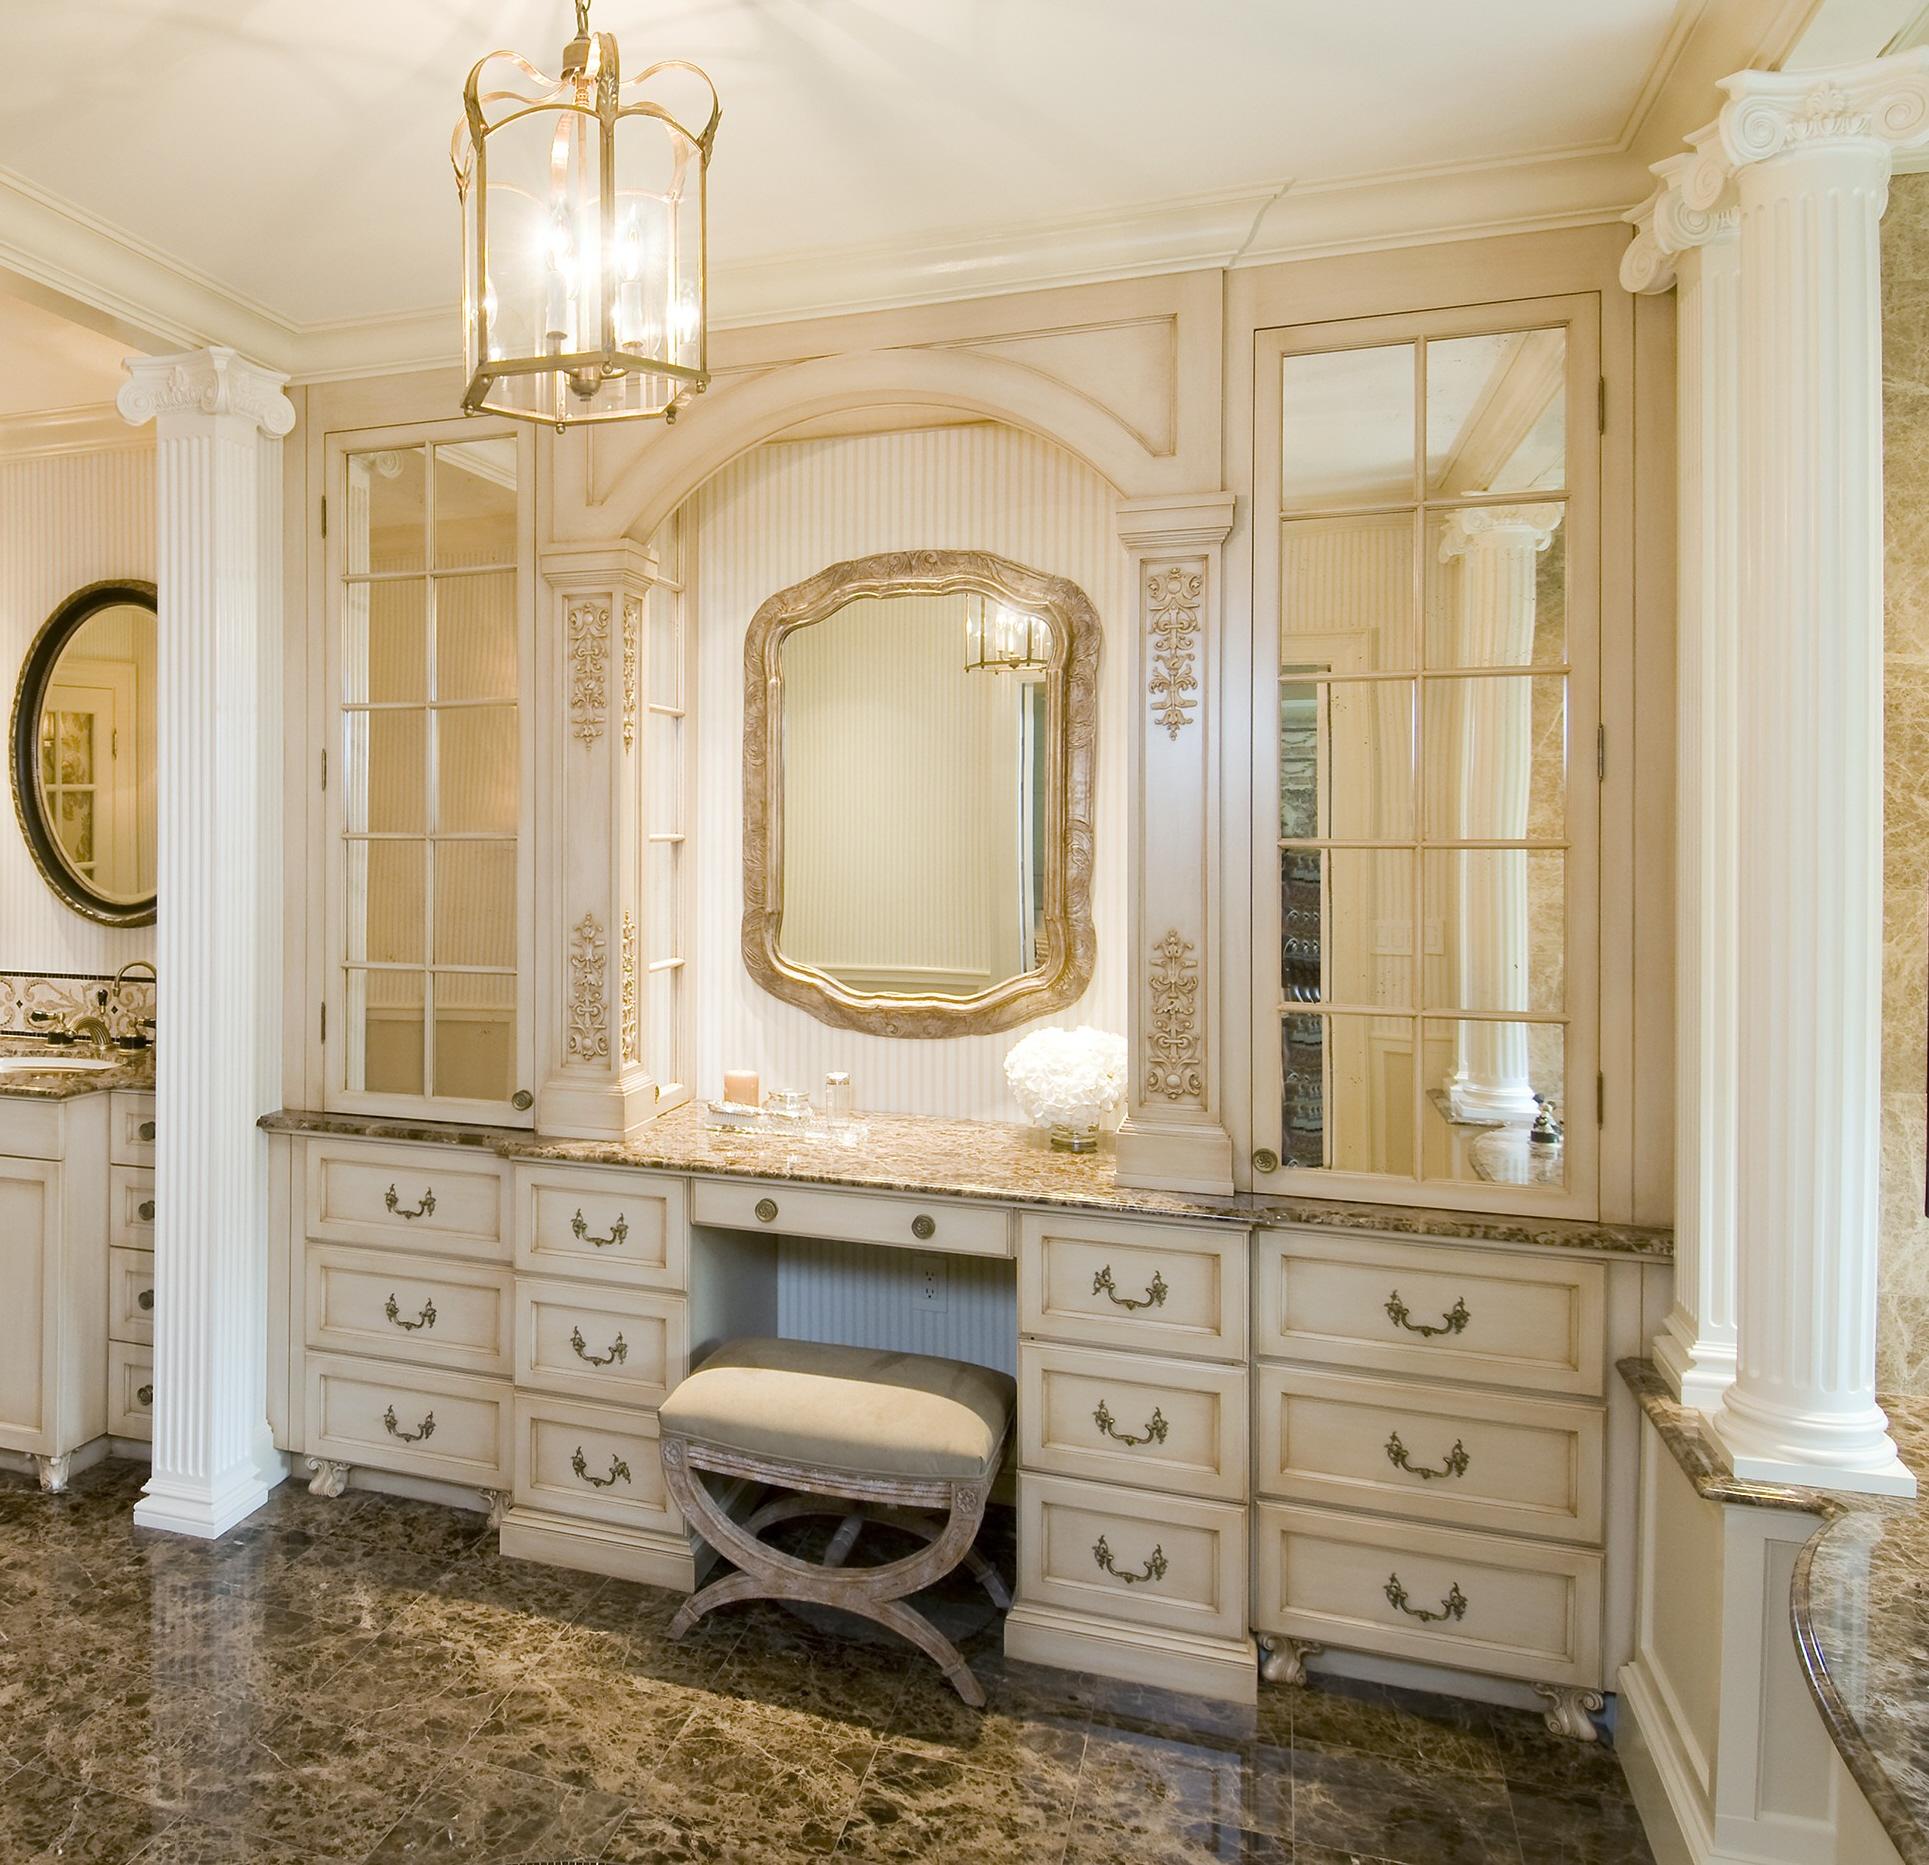 Boston interior design firm wilson kelsey design s award for Award winning bathrooms